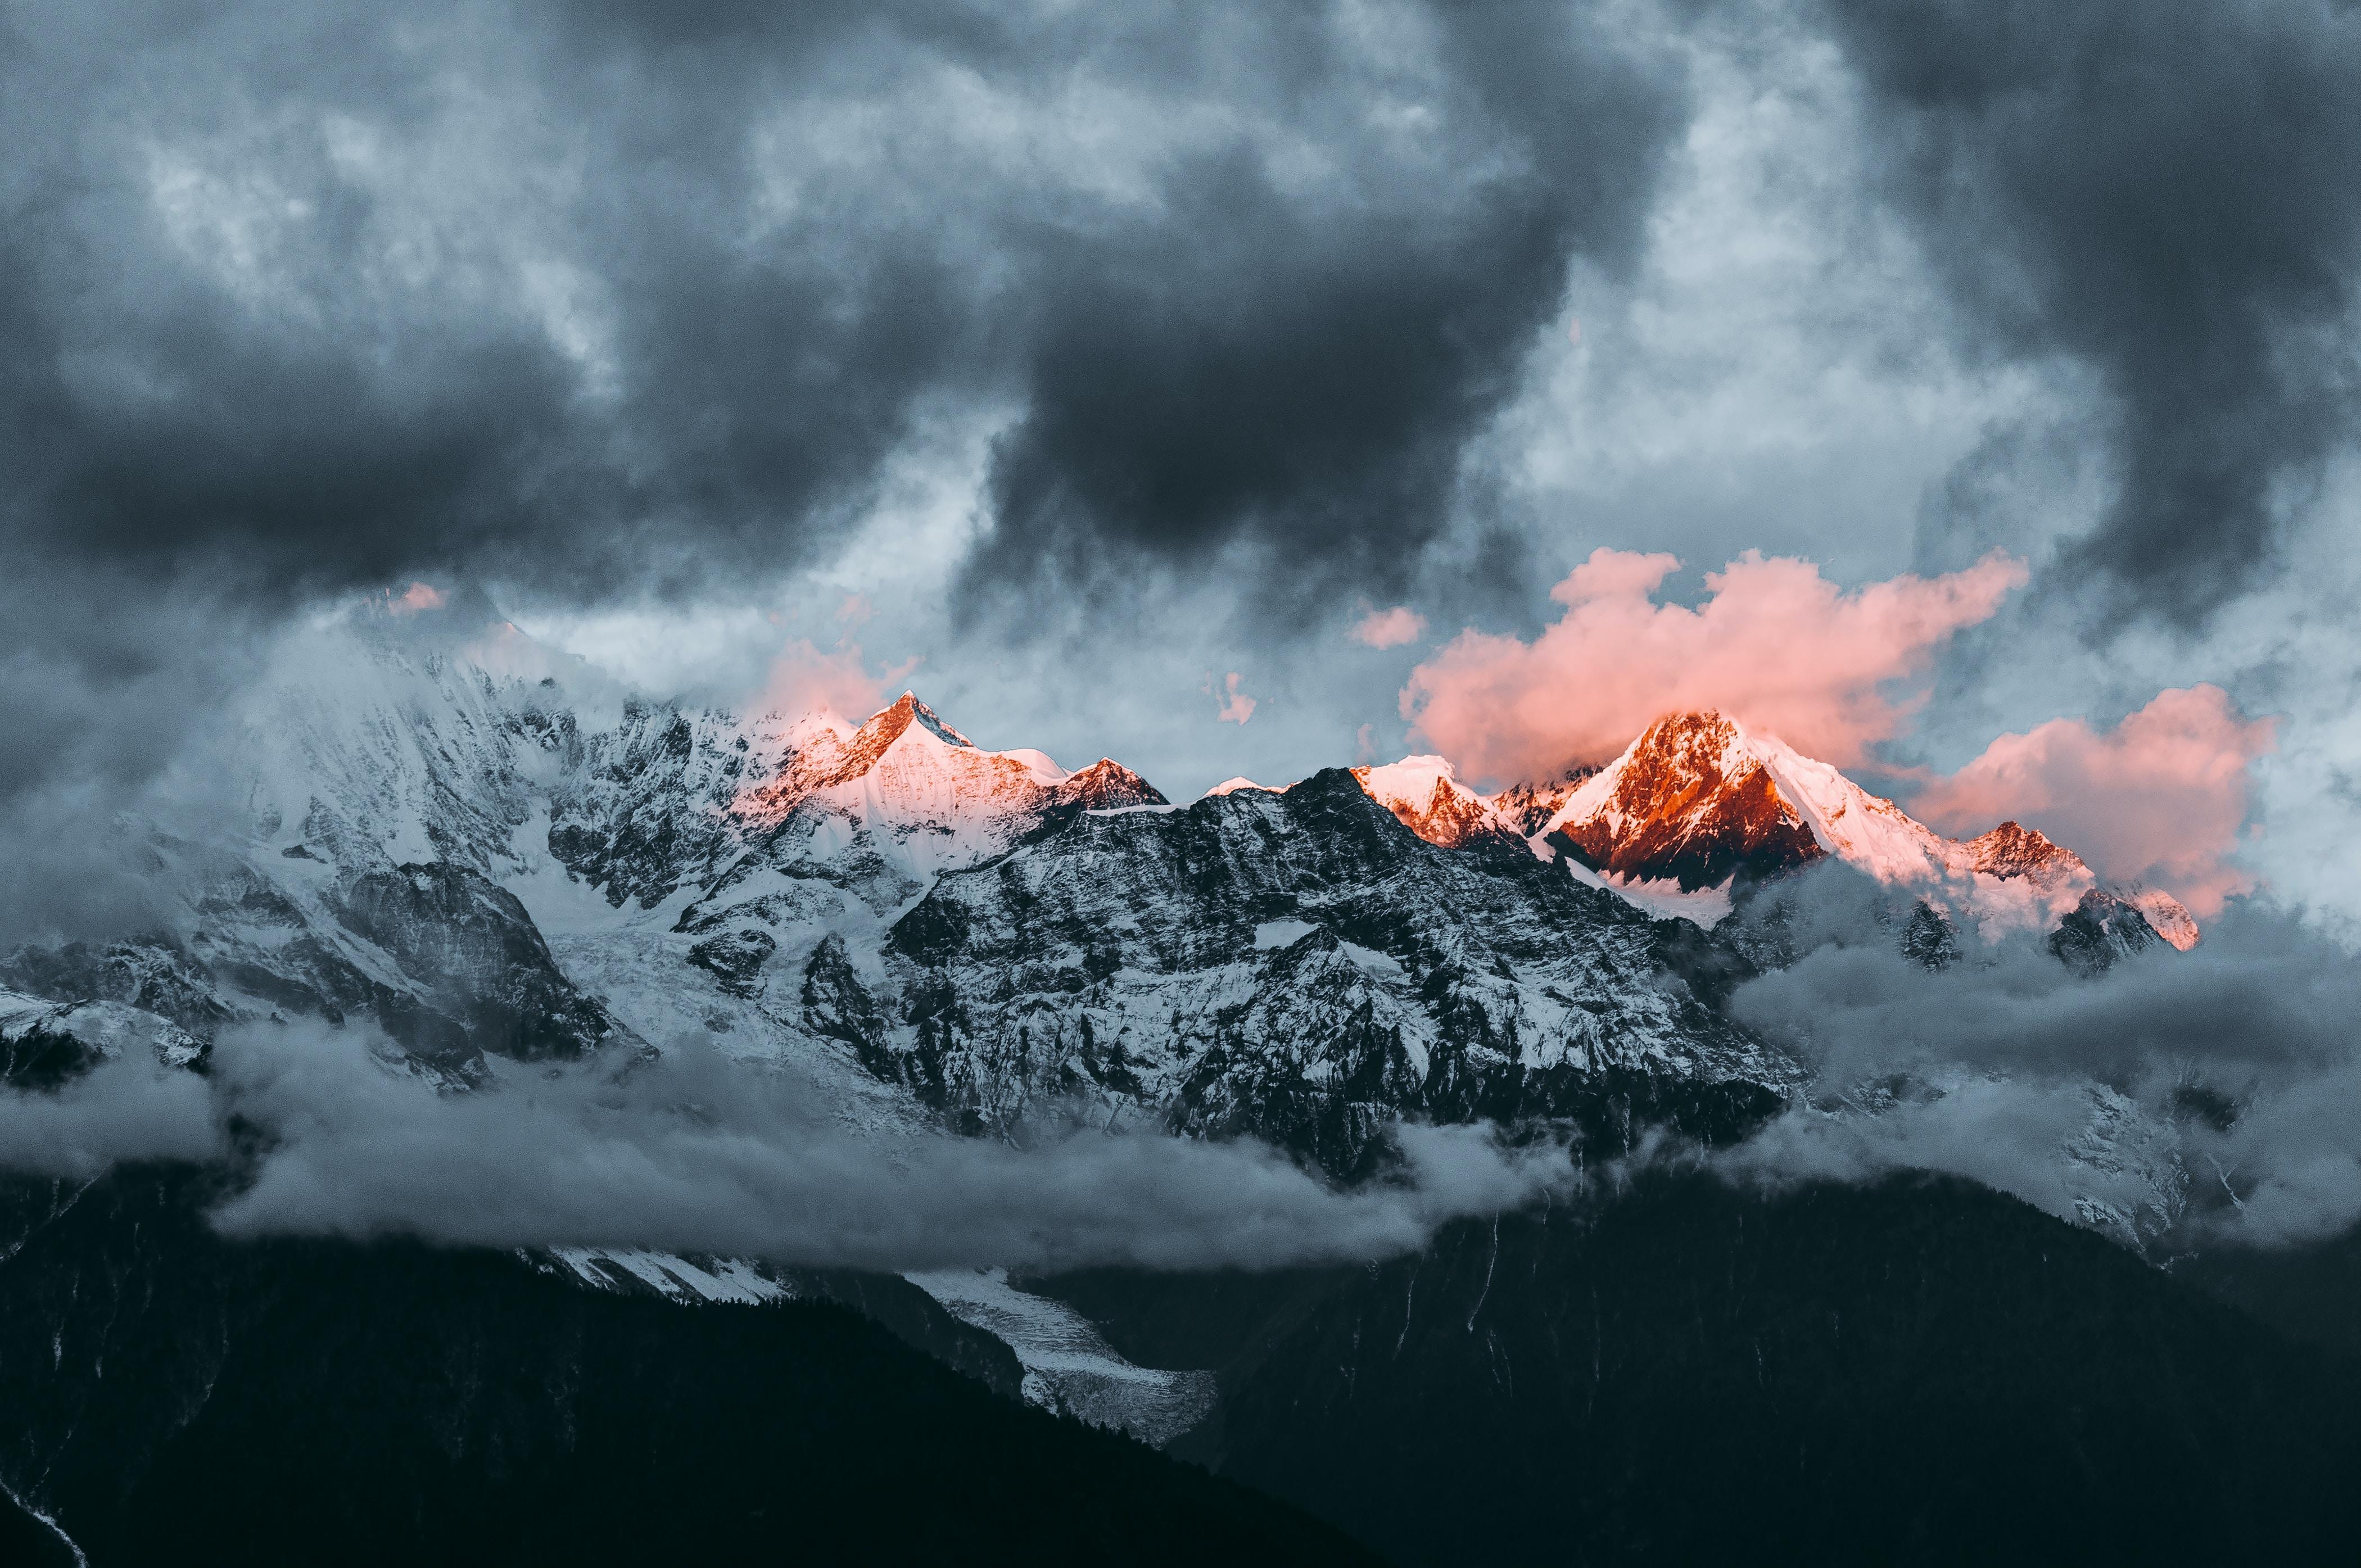 mountain under nimbus clouds